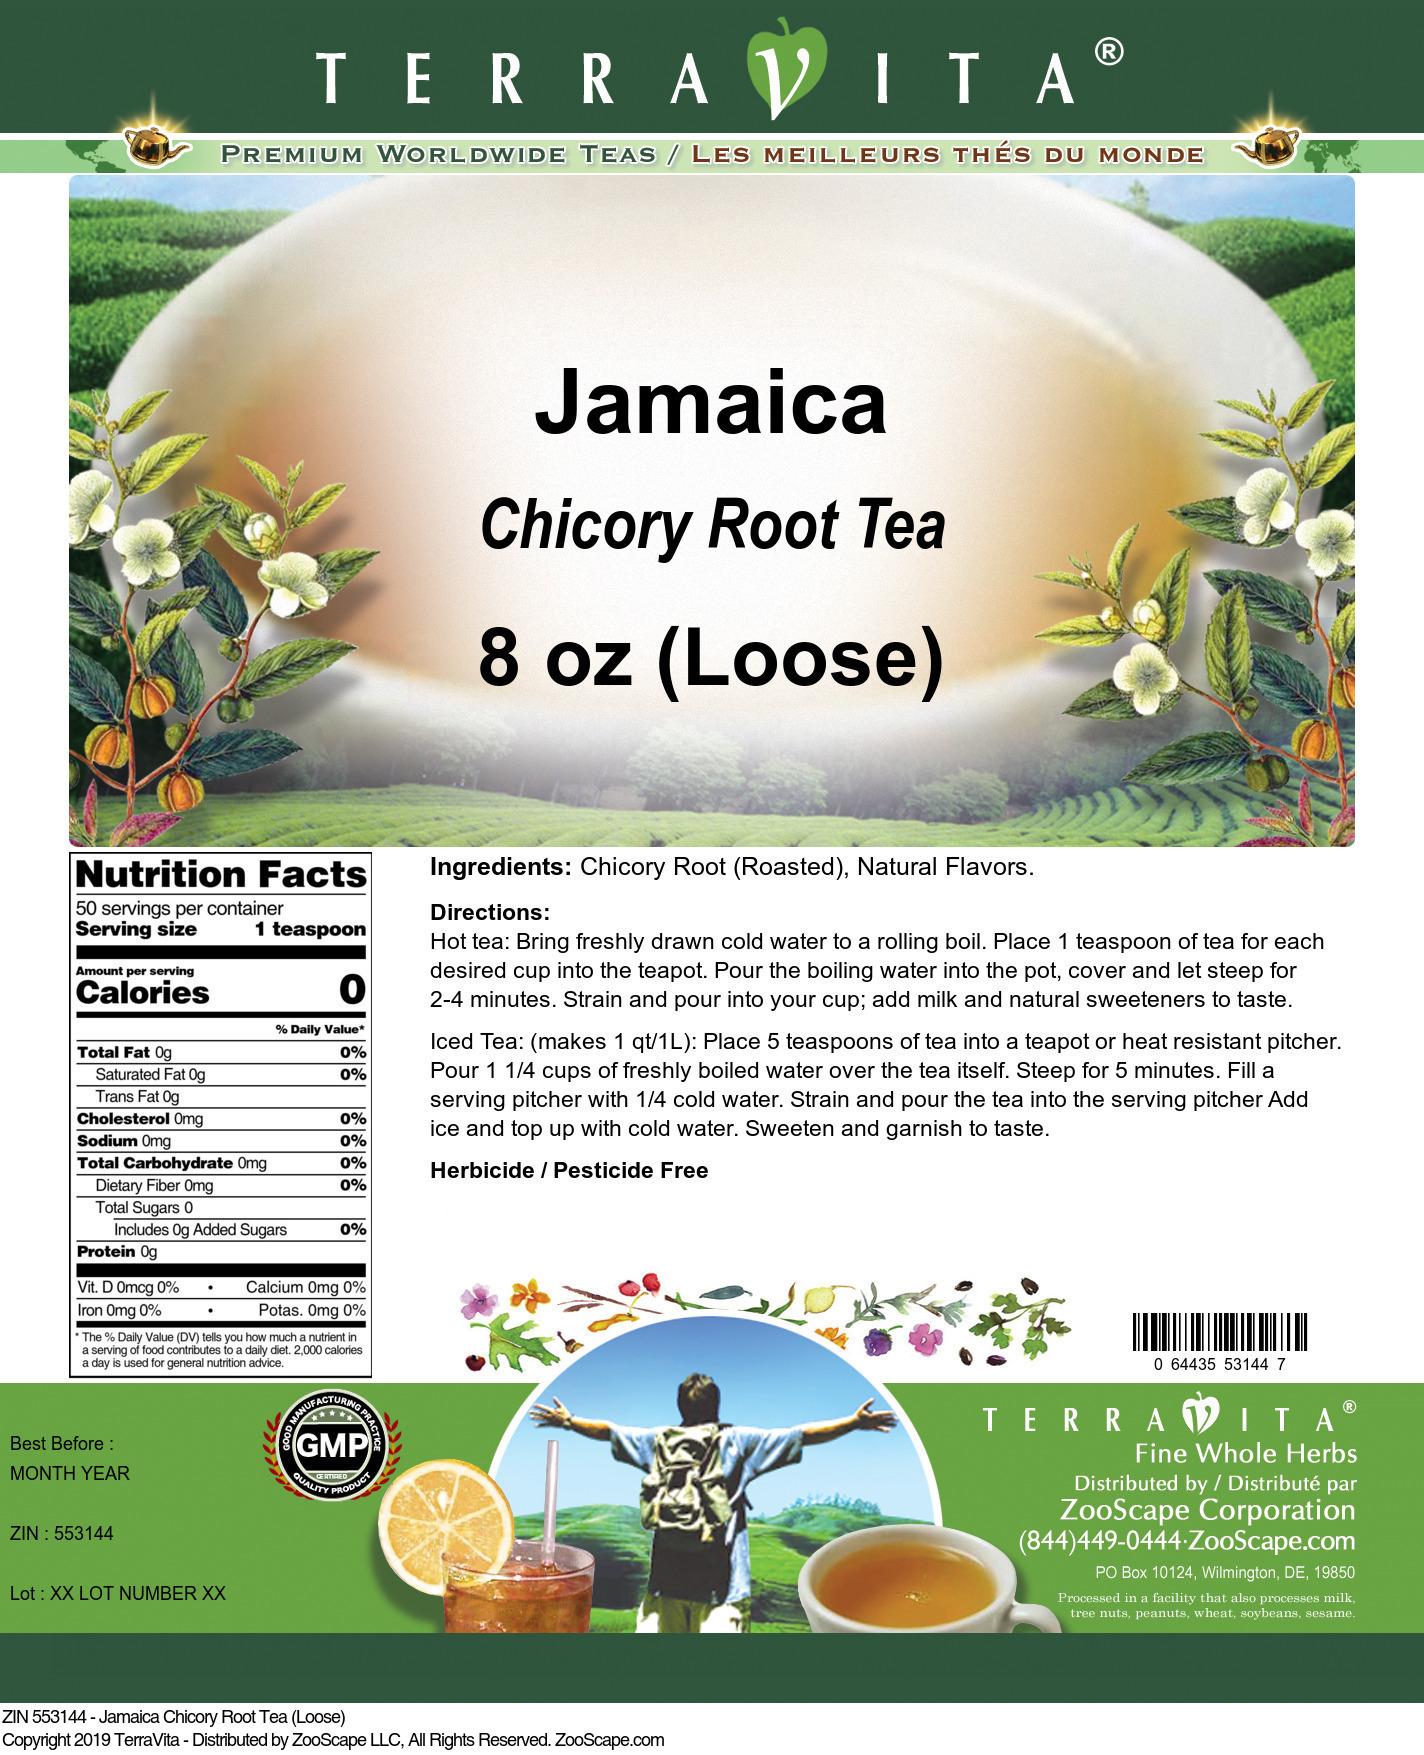 Jamaica Chicory Root Tea (Loose)